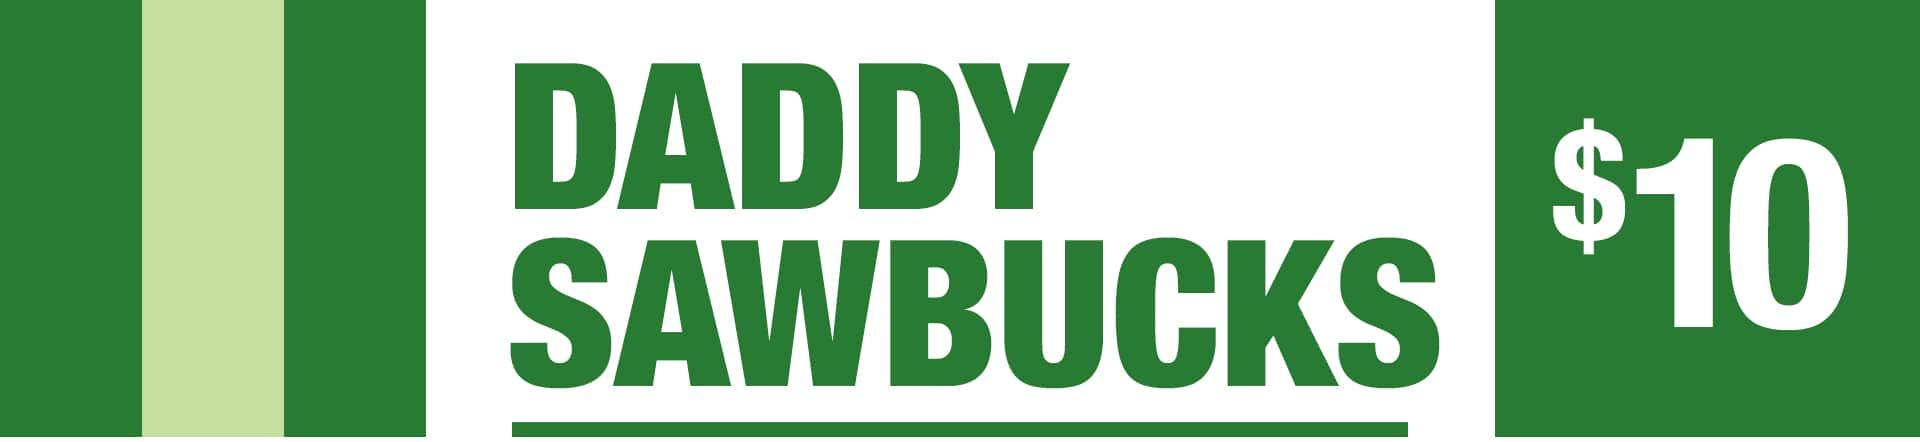 Daddy Sawbucks - Ten Dollar Sawbucks